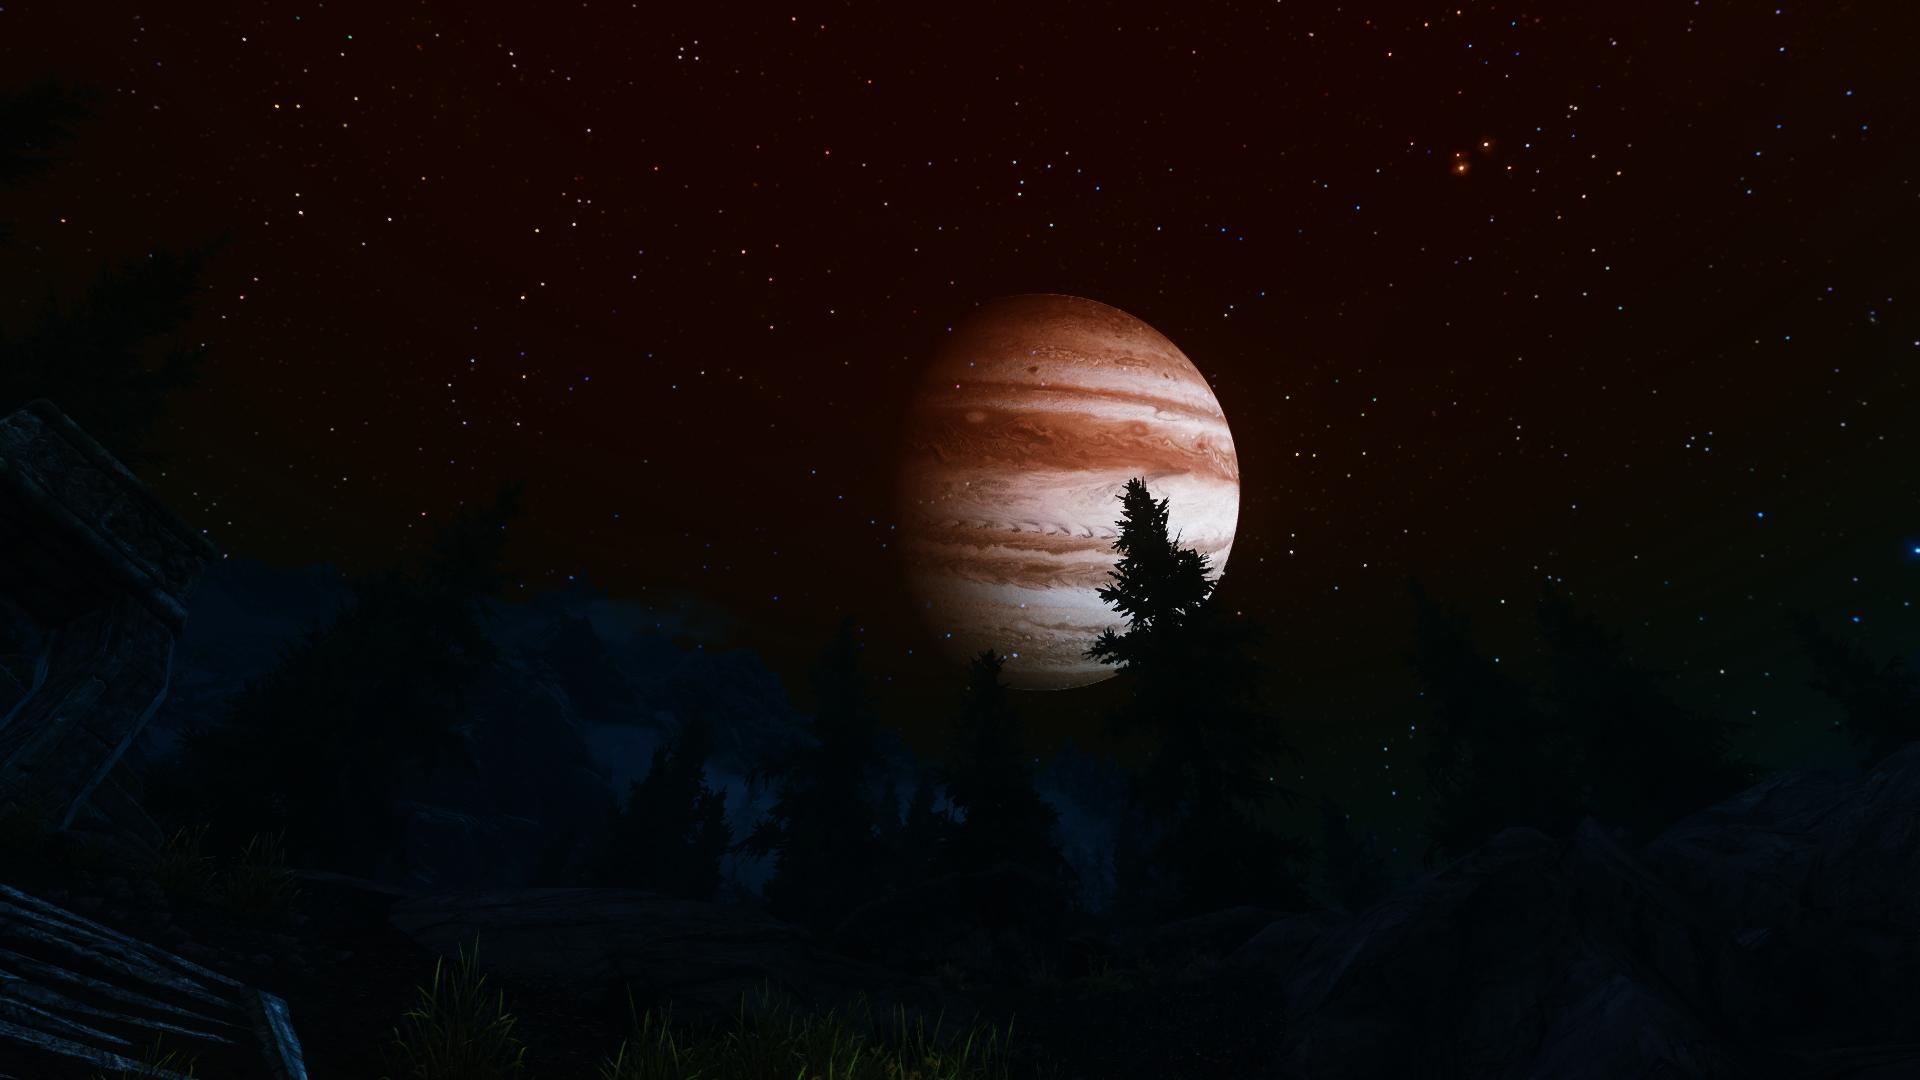 000772.Jpg - Elder Scrolls 5: Skyrim, the